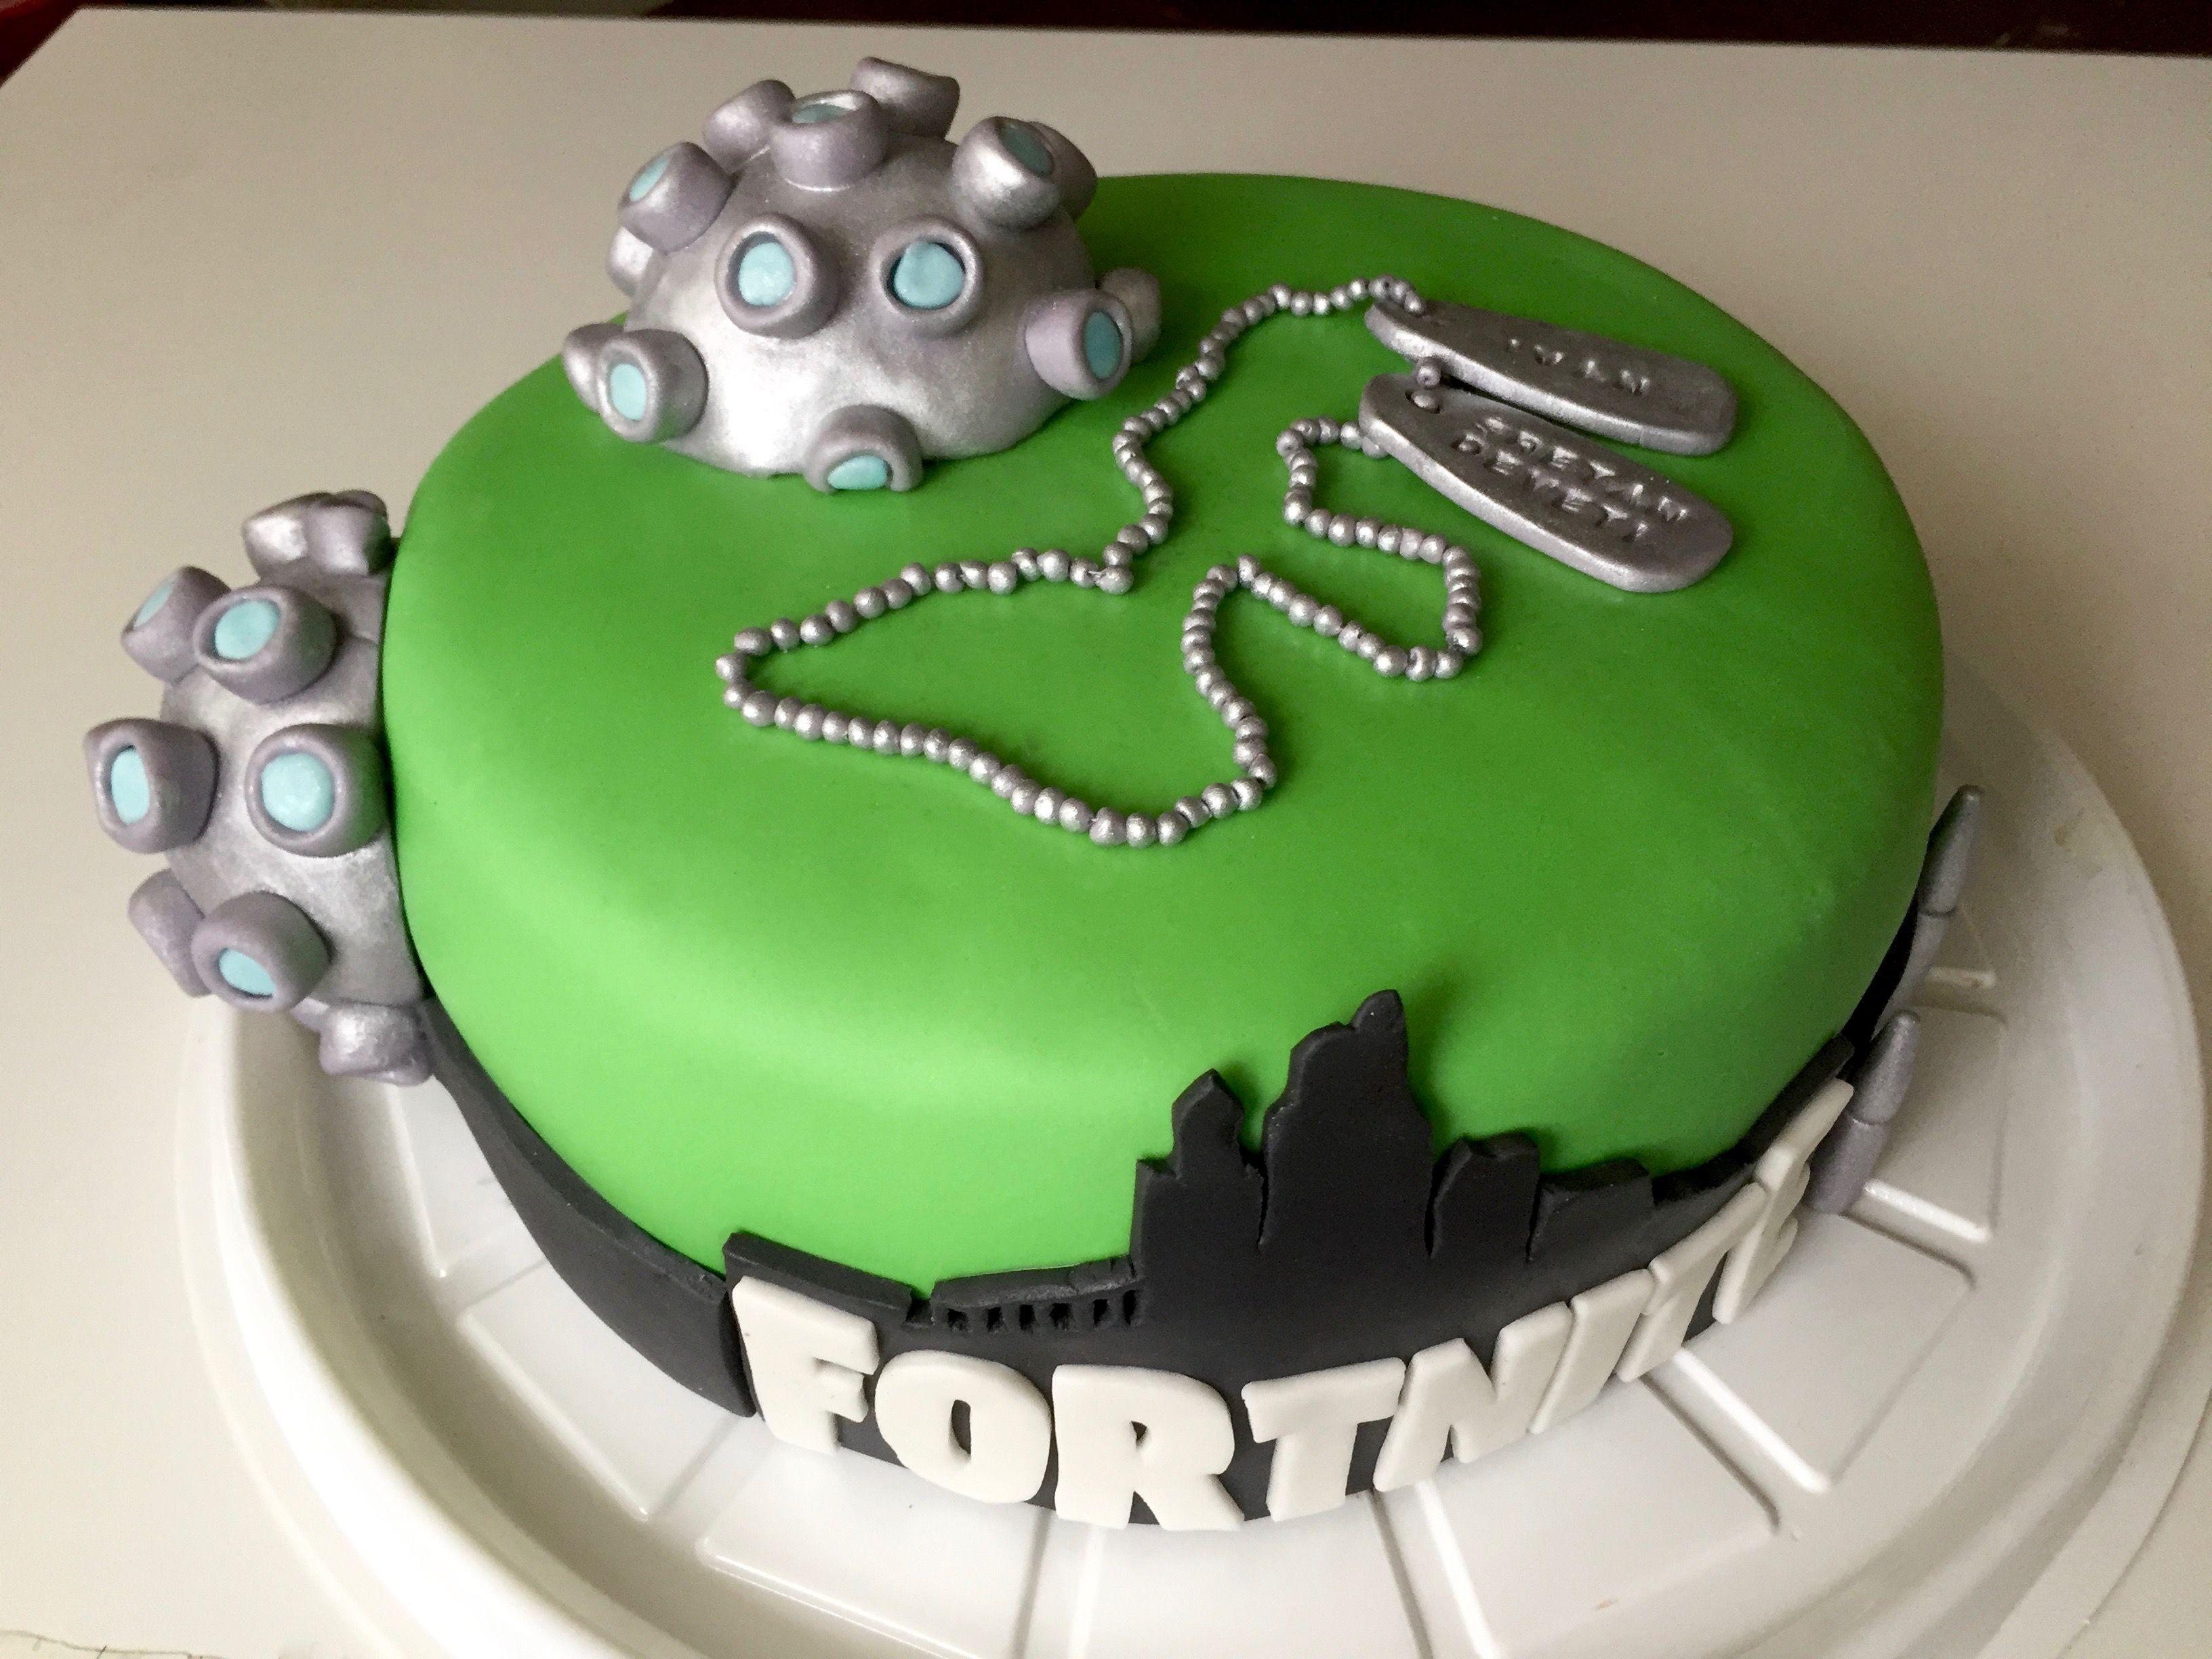 Fortnite Cake How To Make Bomb Very Easy